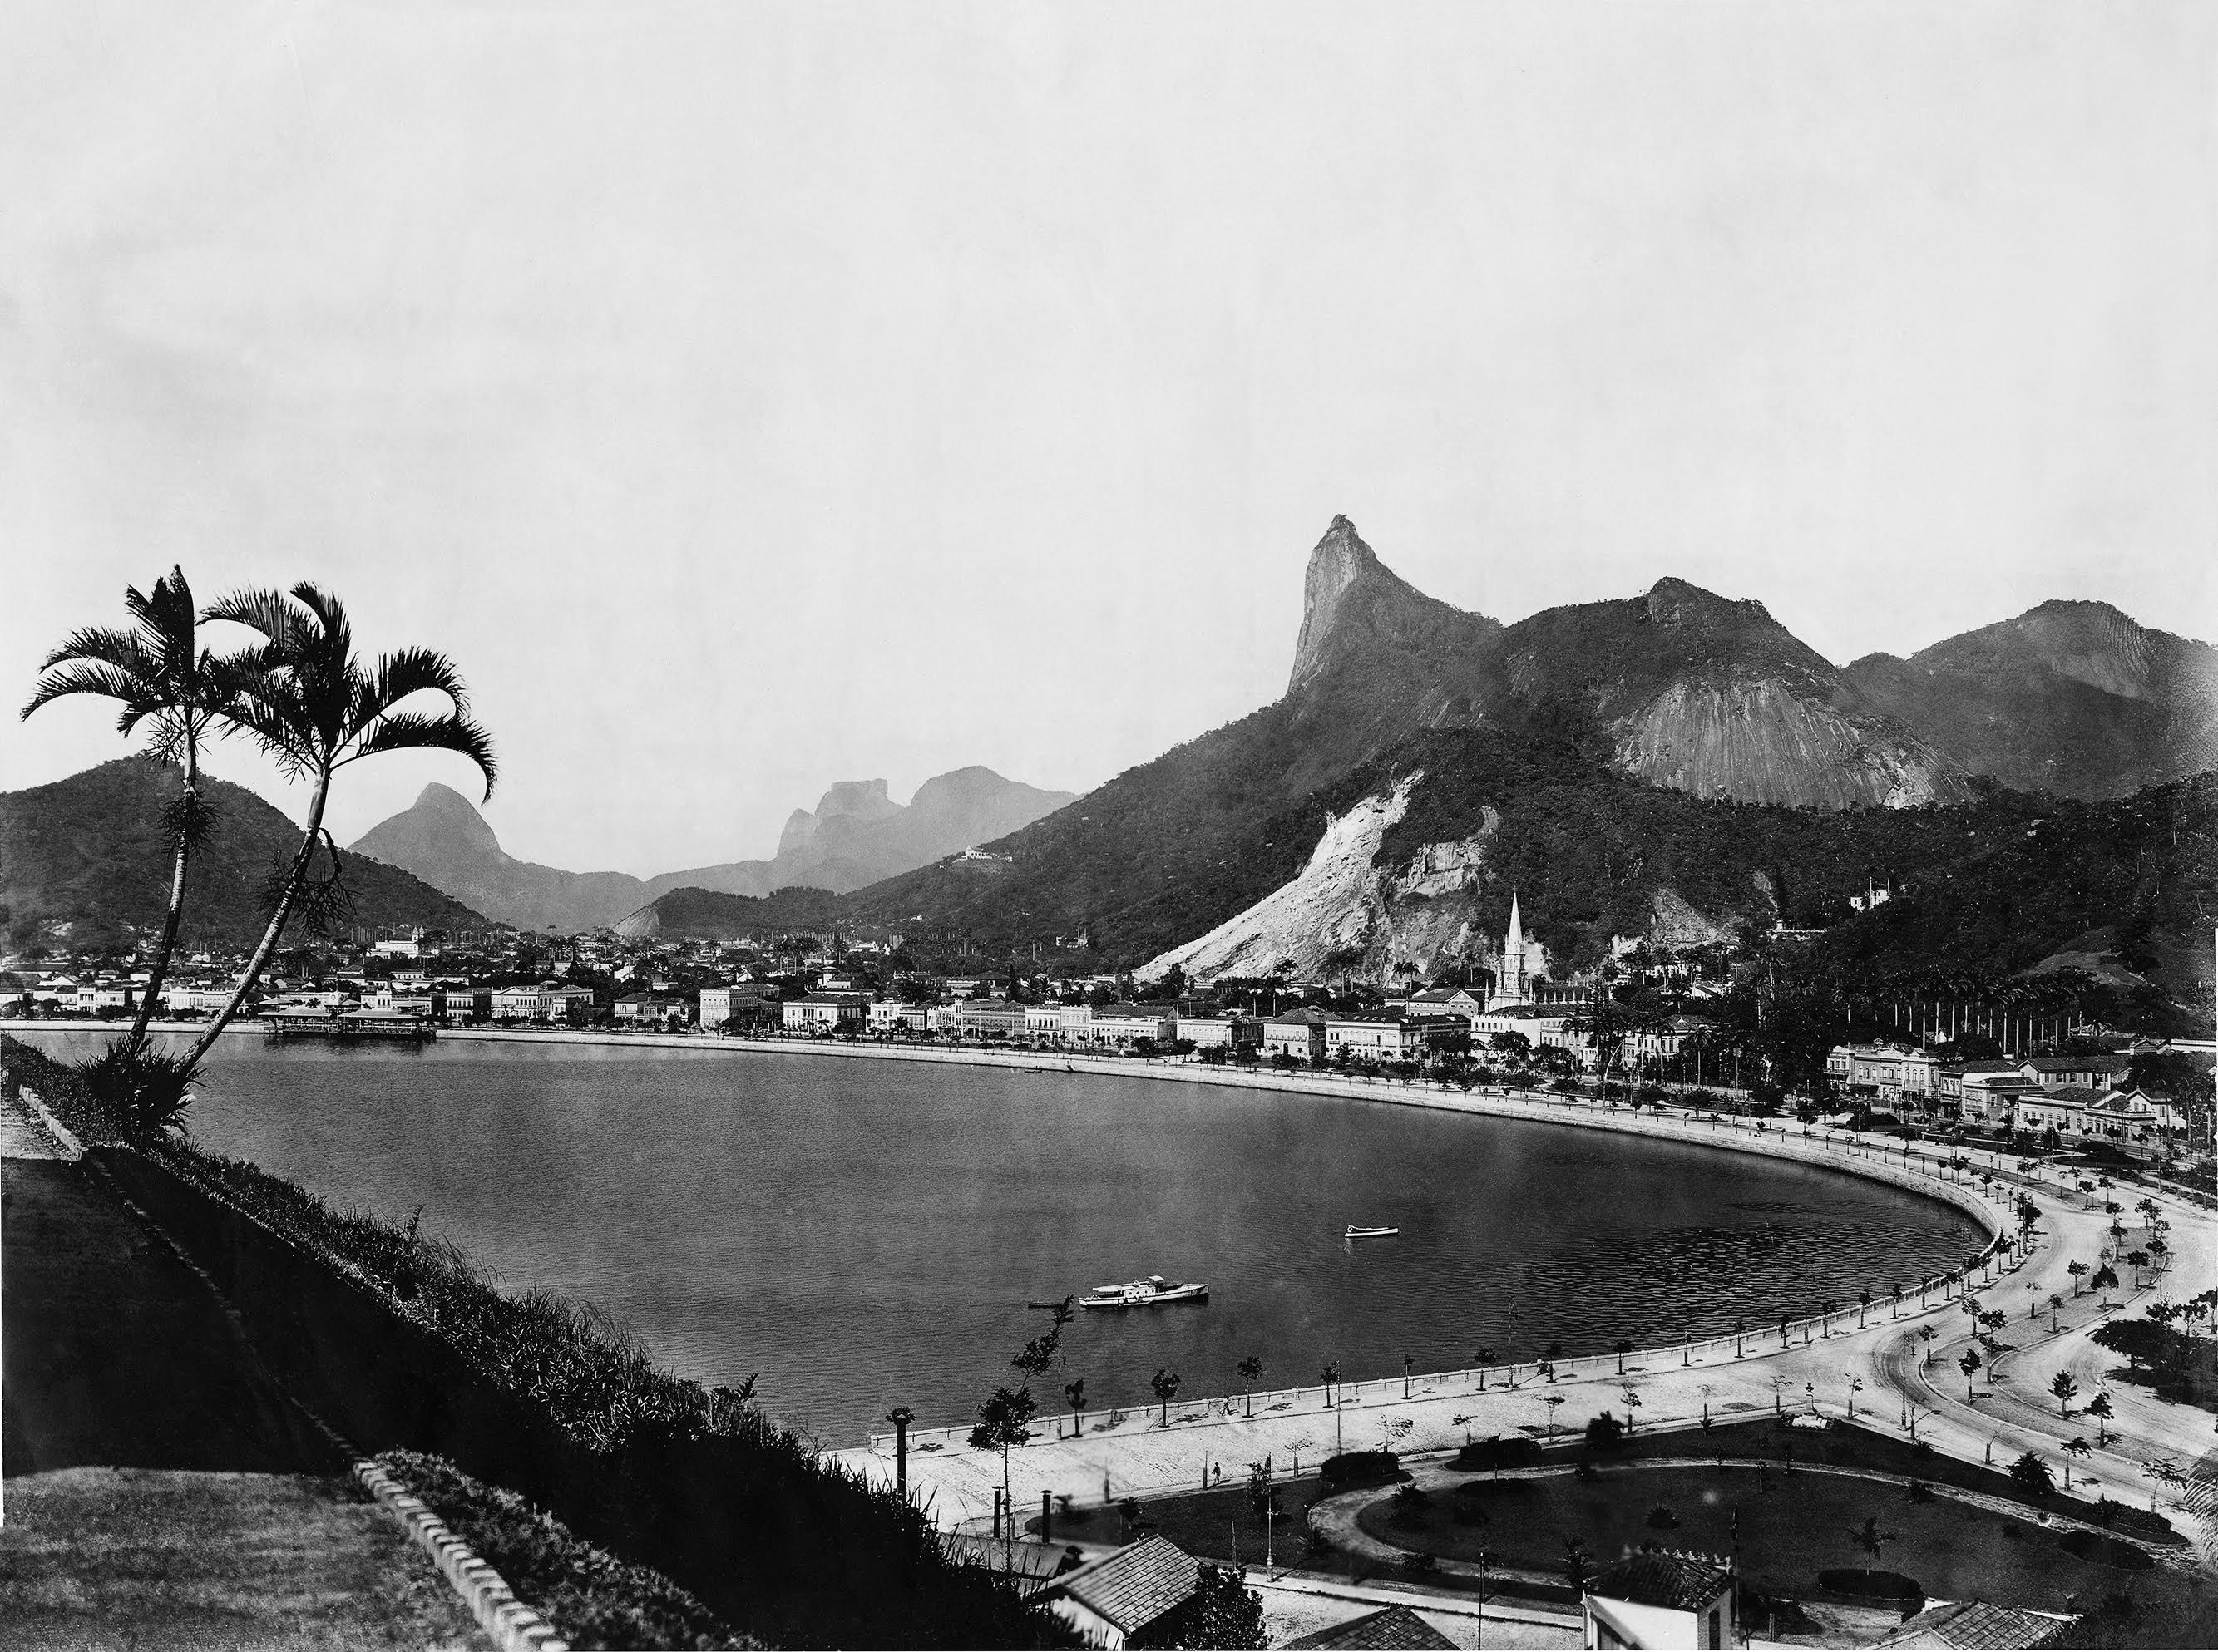 Enseada de Botafogo: essa vista seria retratada constantemente nas décadas posteriores